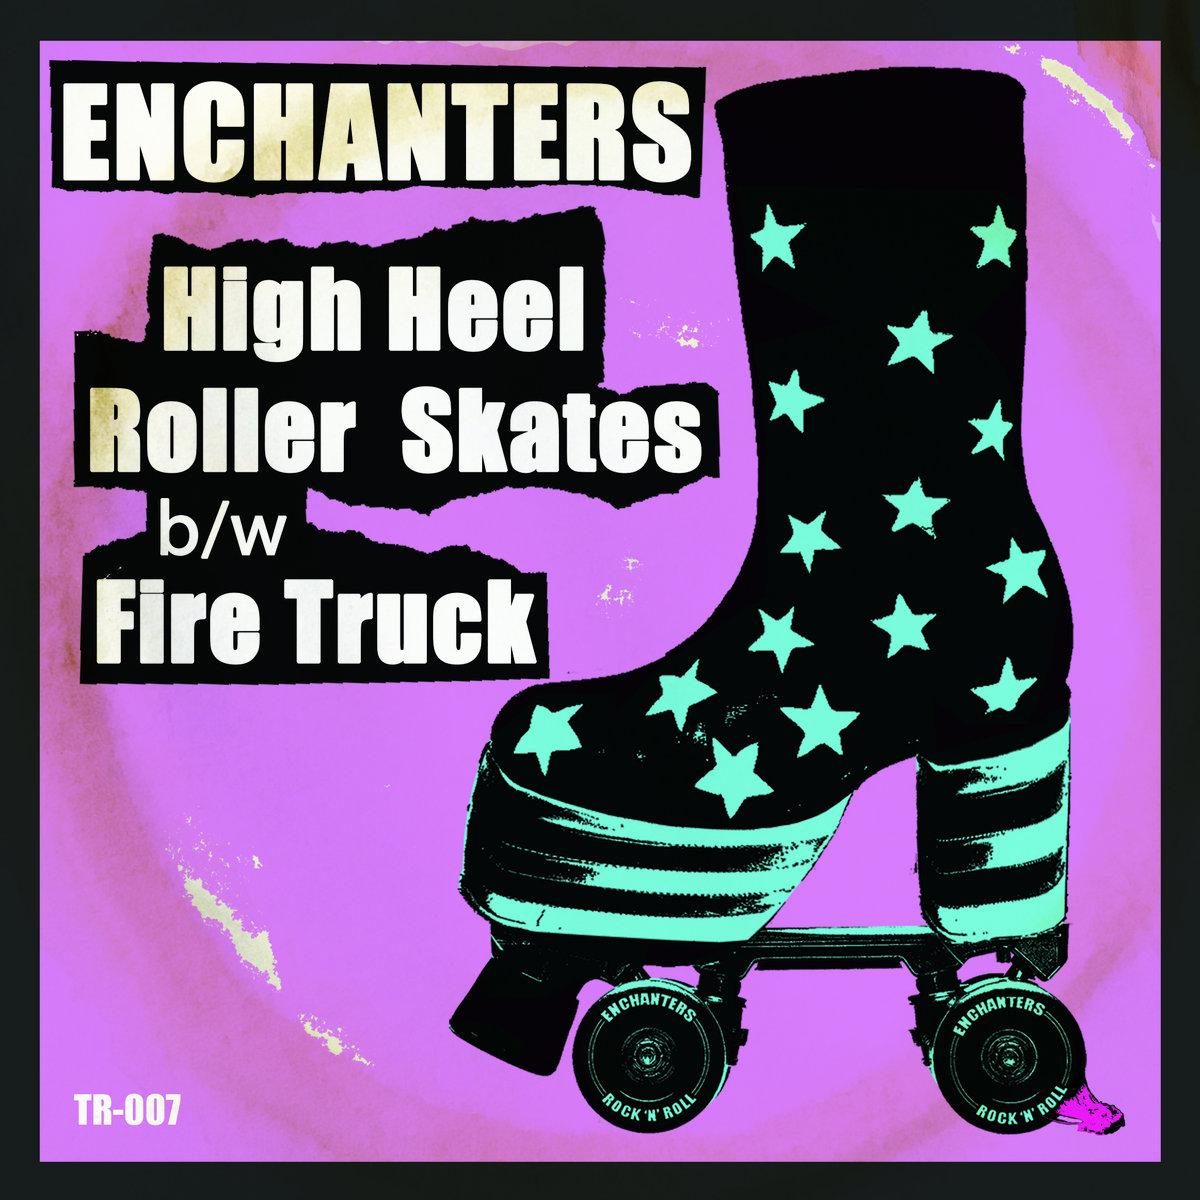 High Heel Roller Skates | Enchanters